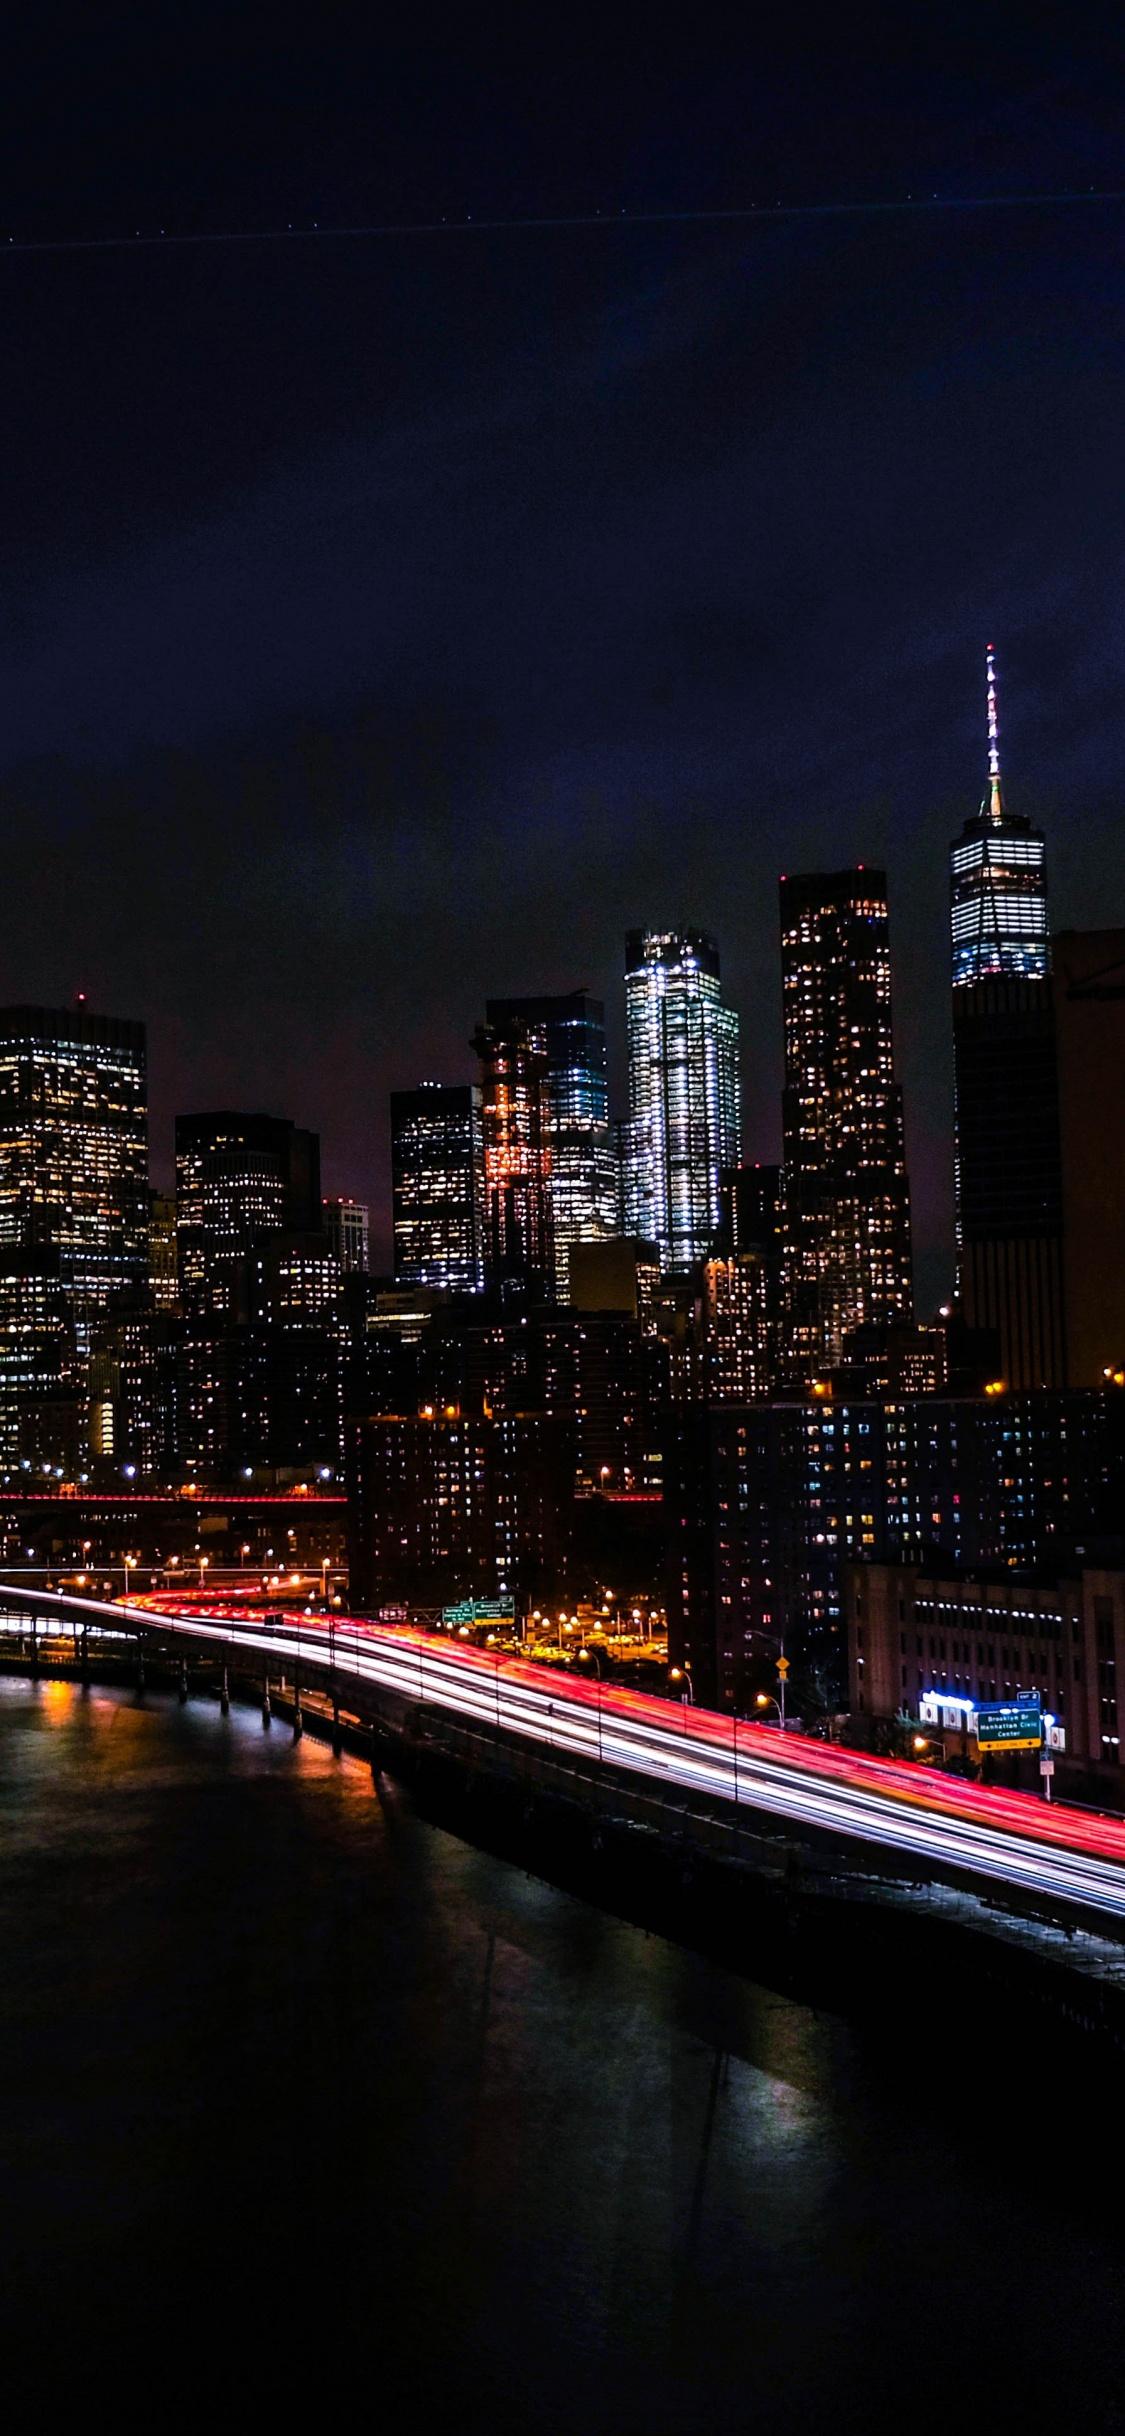 New York City 4k Wallpaper Night Cityscape City Lights Timelapse Night Traffic 5k World 1842